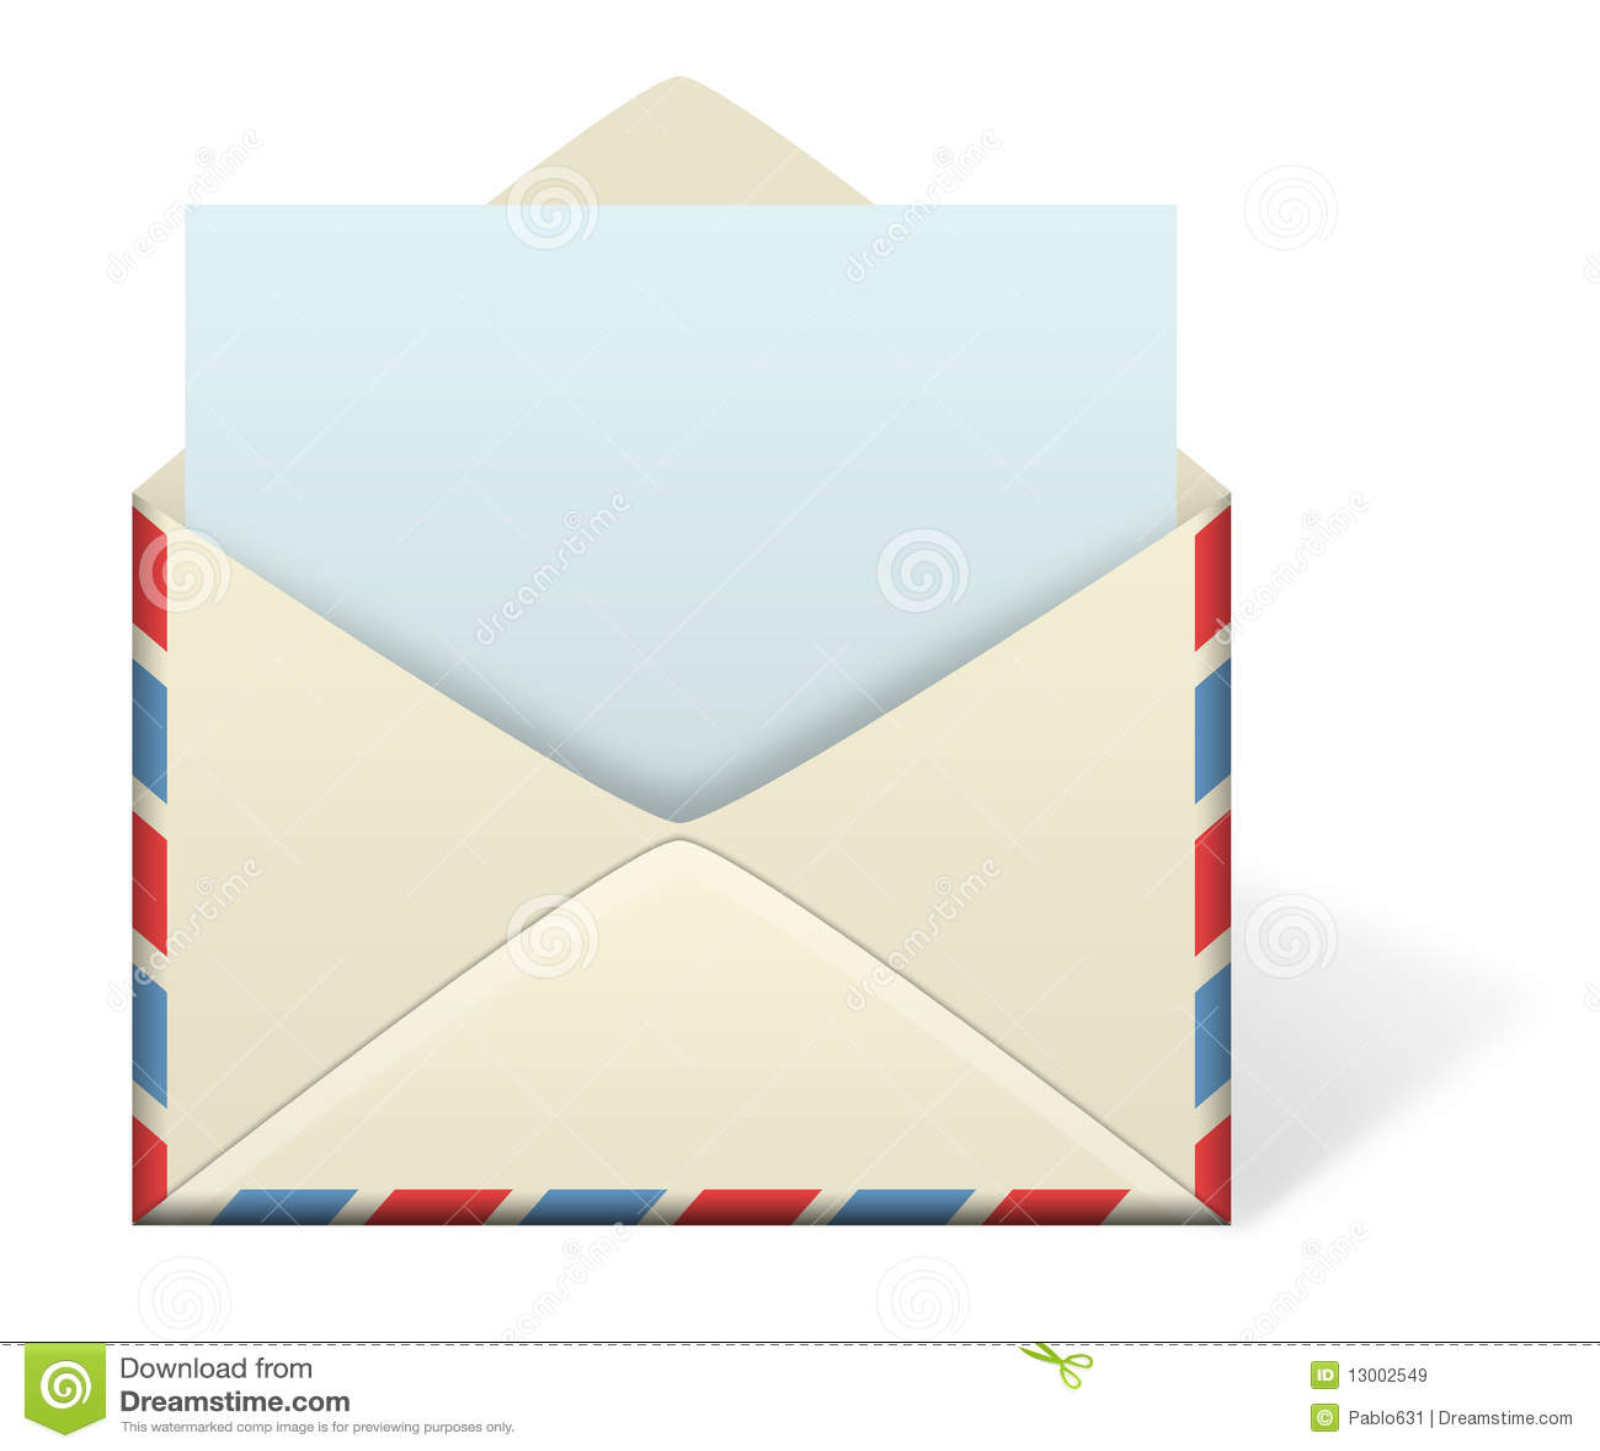 Accept Invitation was luxury invitation sample